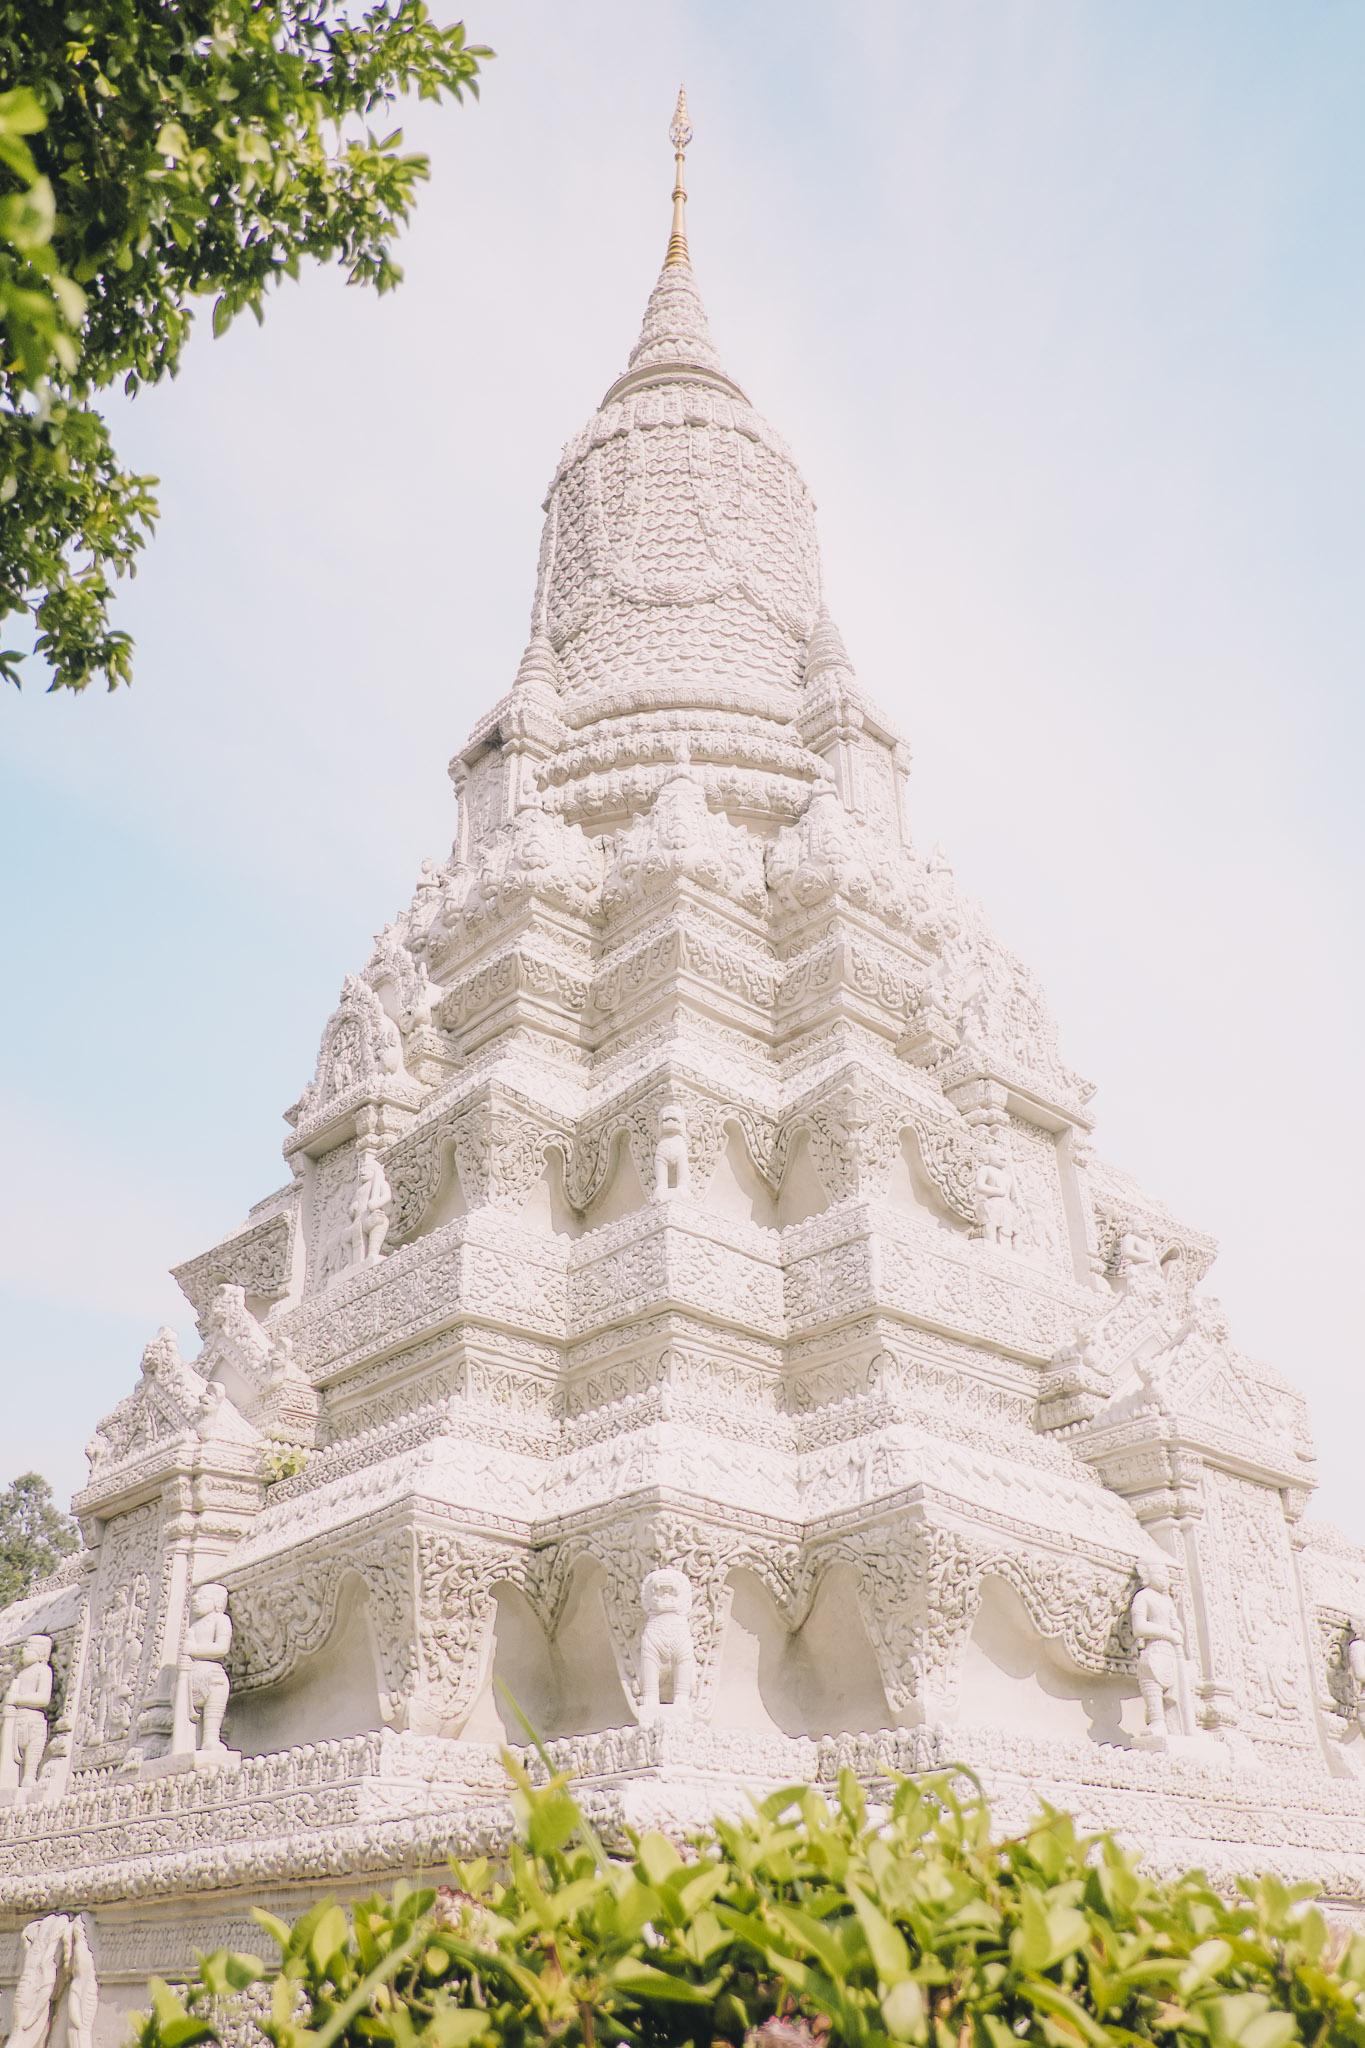 cambodia-phnom-penh-royal-palace-3.jpg